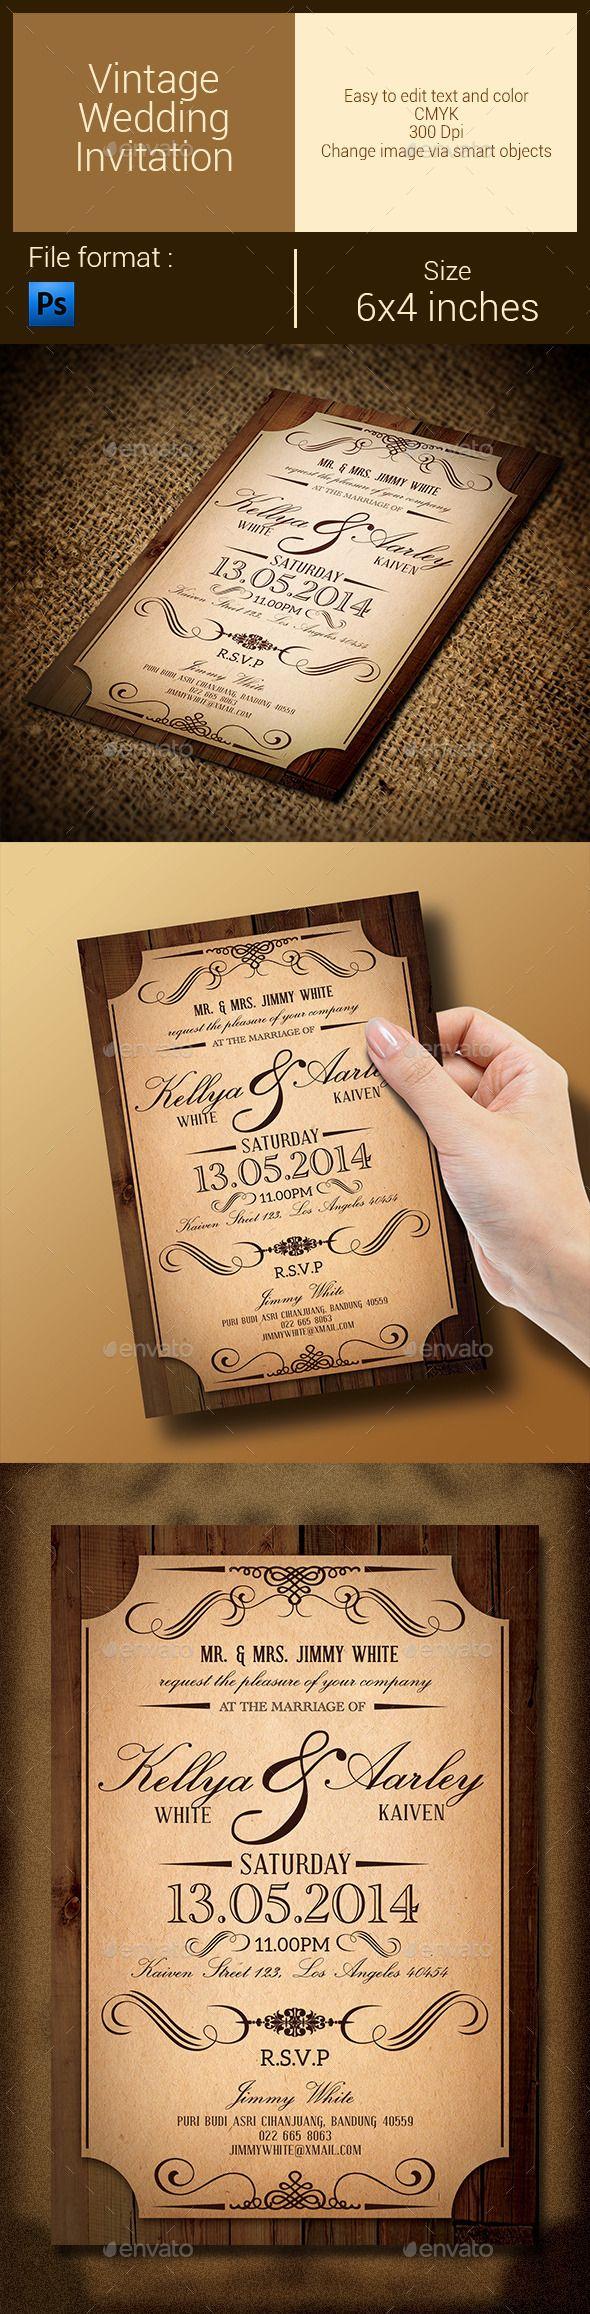 wedding invitation template themeforest%0A Vintage Wedding Invitation Template  Download  http   graphicriver net item